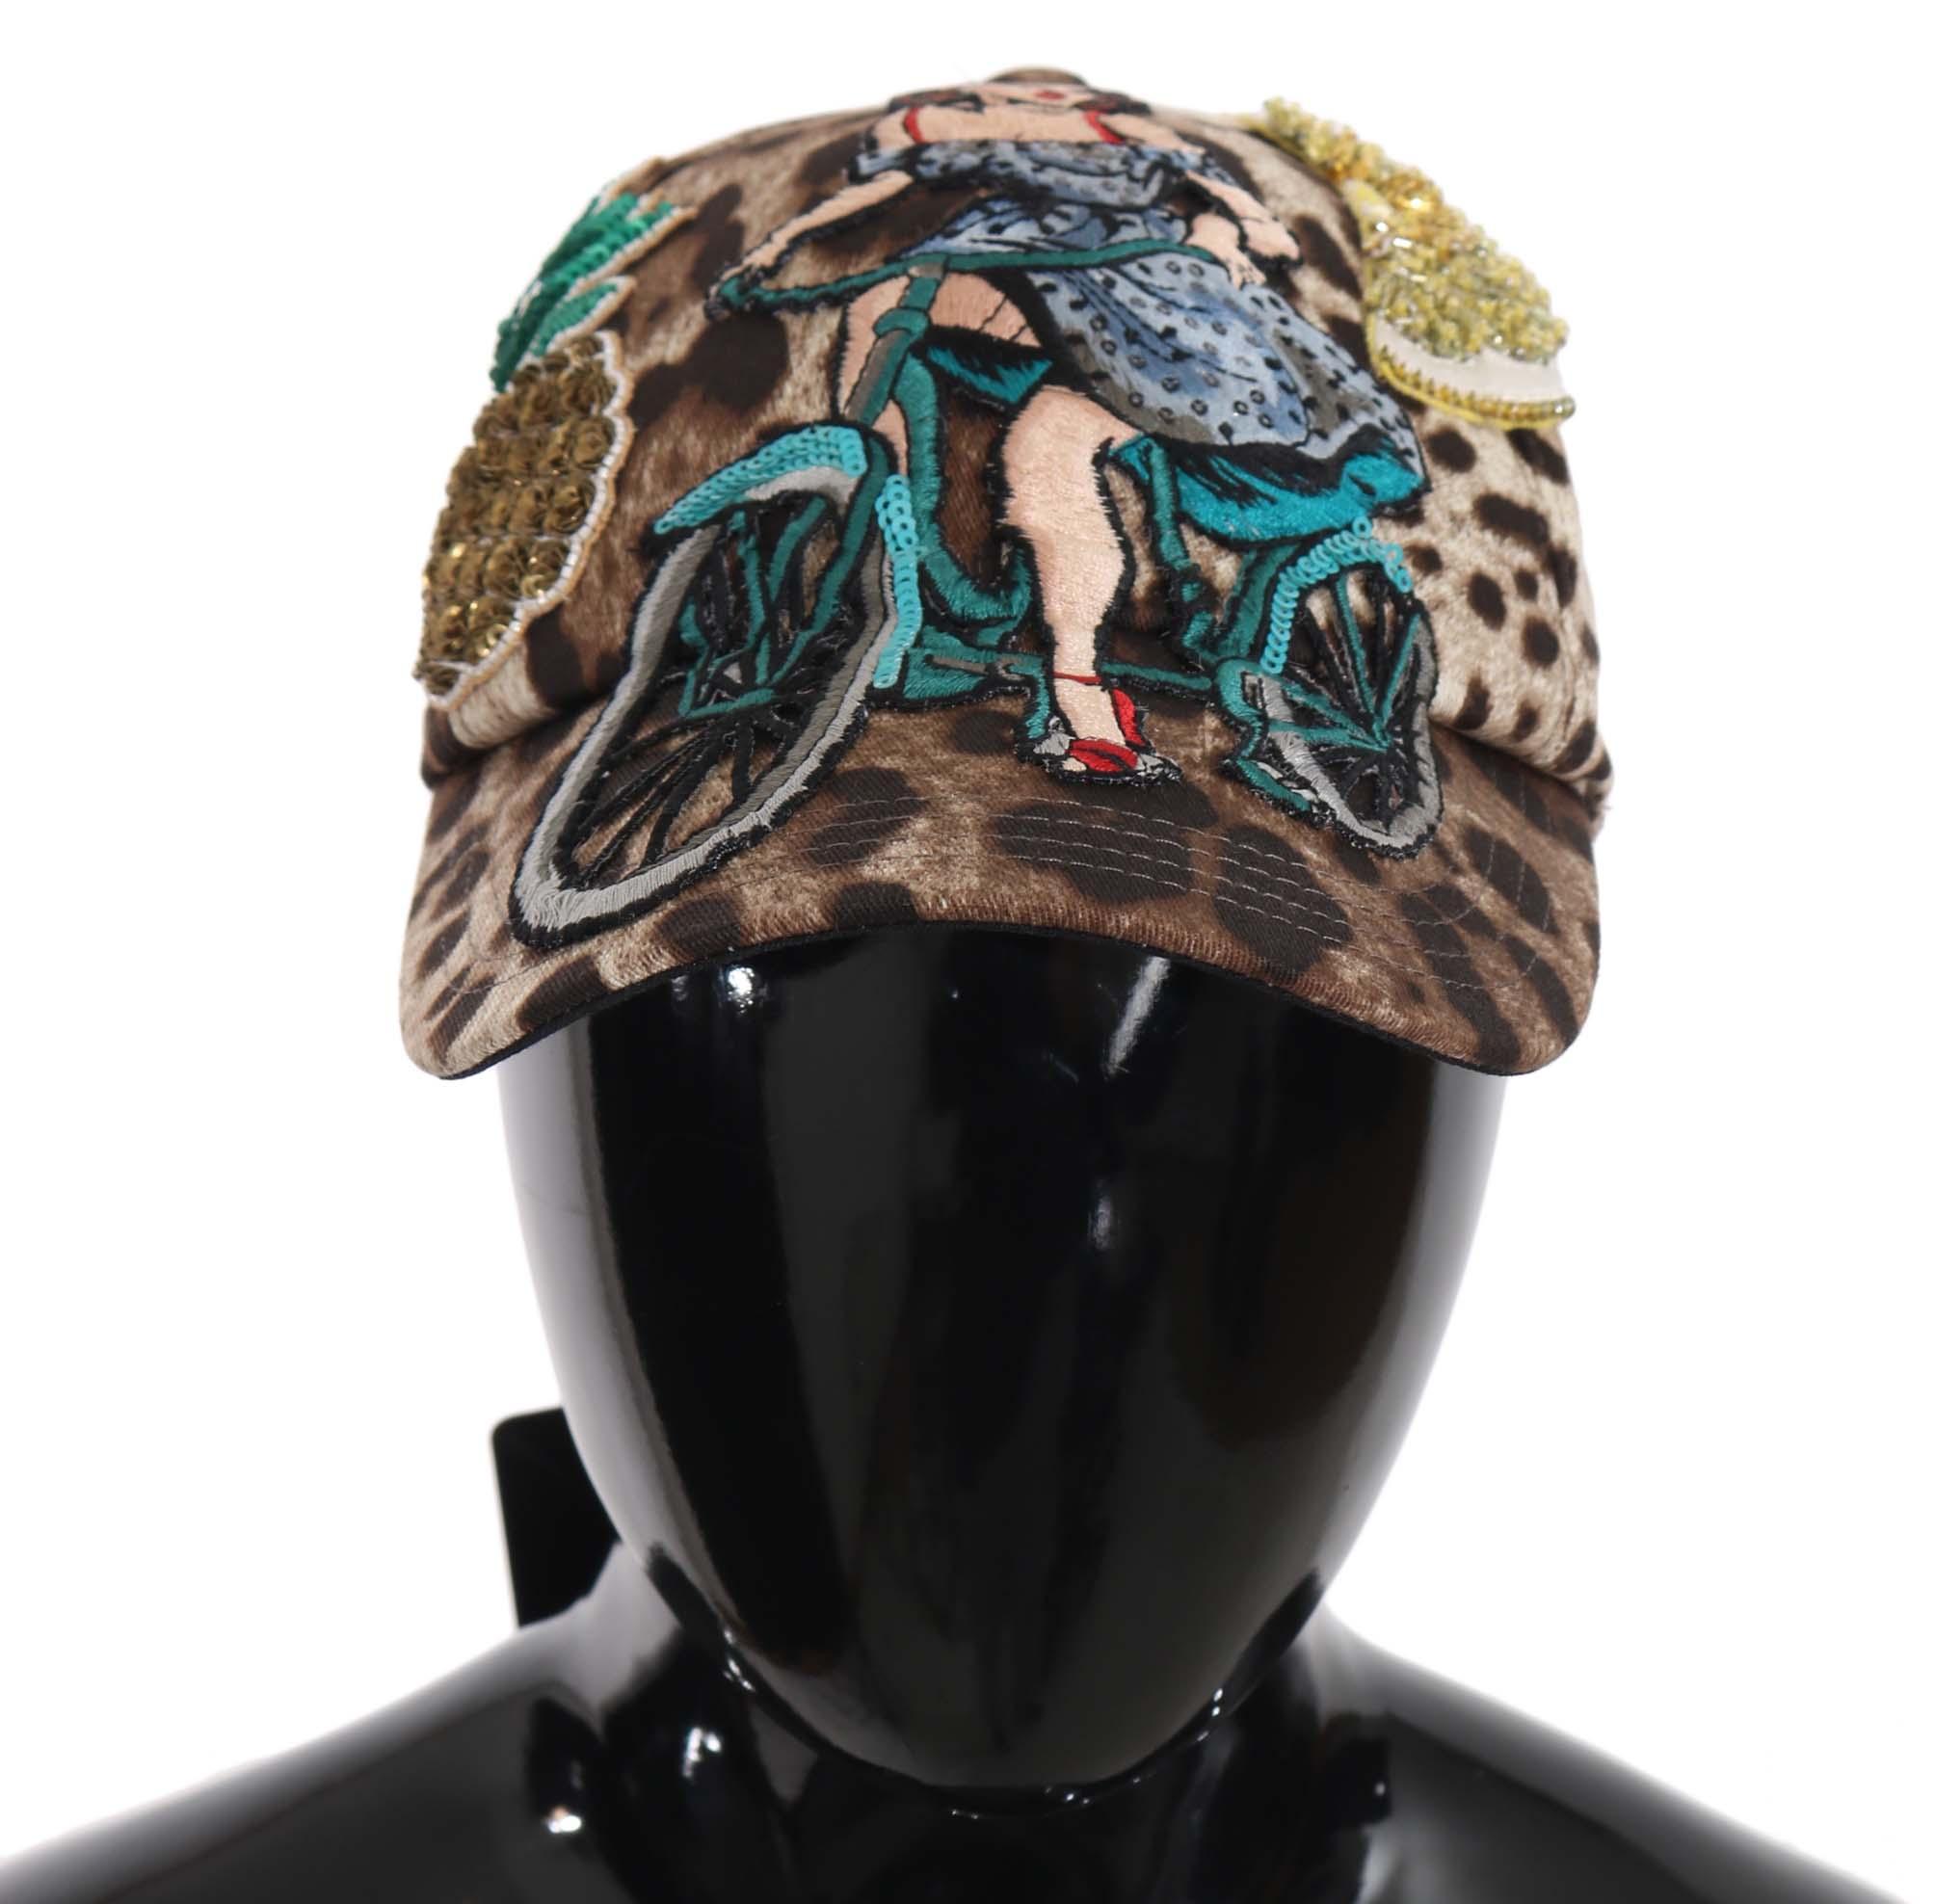 Dolce & Gabbana Women's Leopard Sequin Sicily Applique Baseball Hat Brown HAT70141 - 56 cm|XS